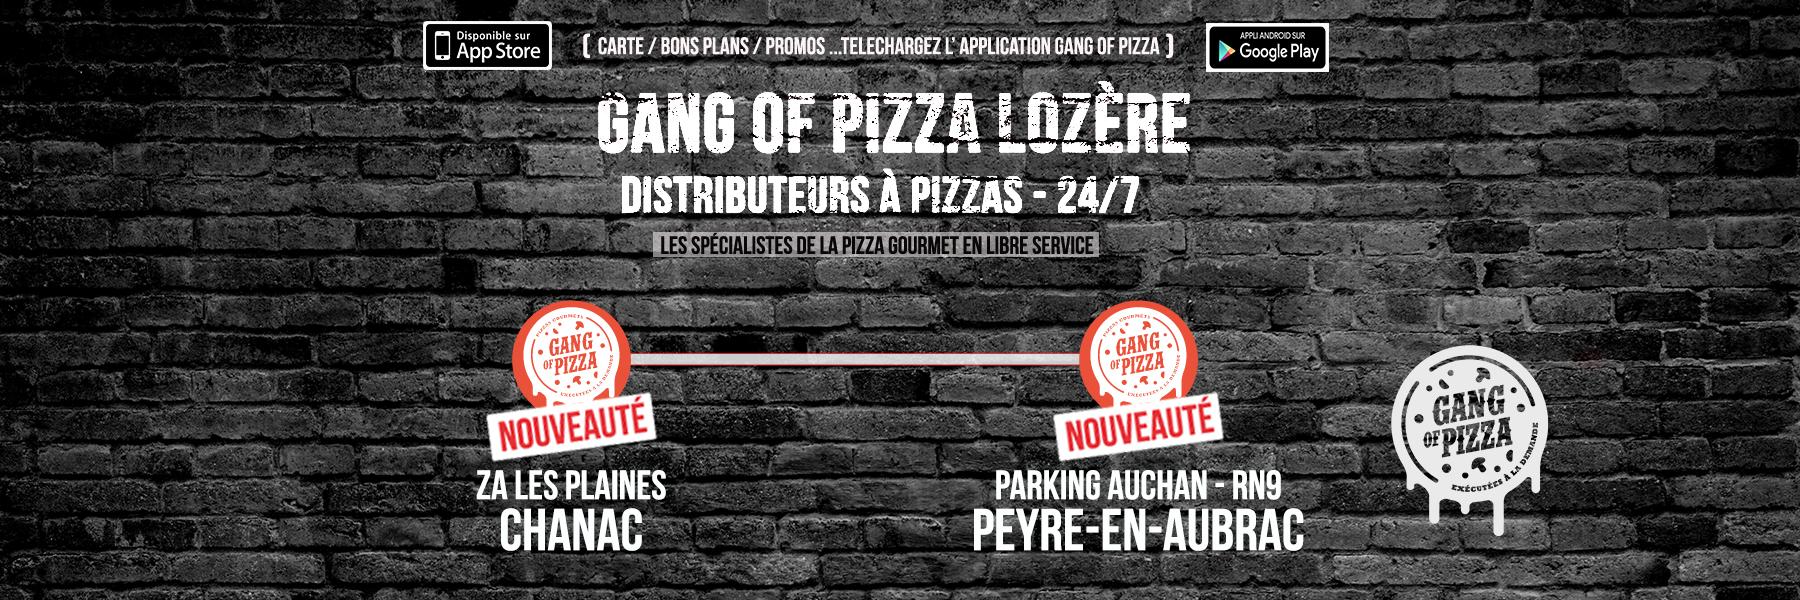 gang-of-pizza-gangofpizza-debarque-a-peyre-en-aubrac-chanac-lozere-distributeur-pizzas-24-7-fastfood-pizza-rapide